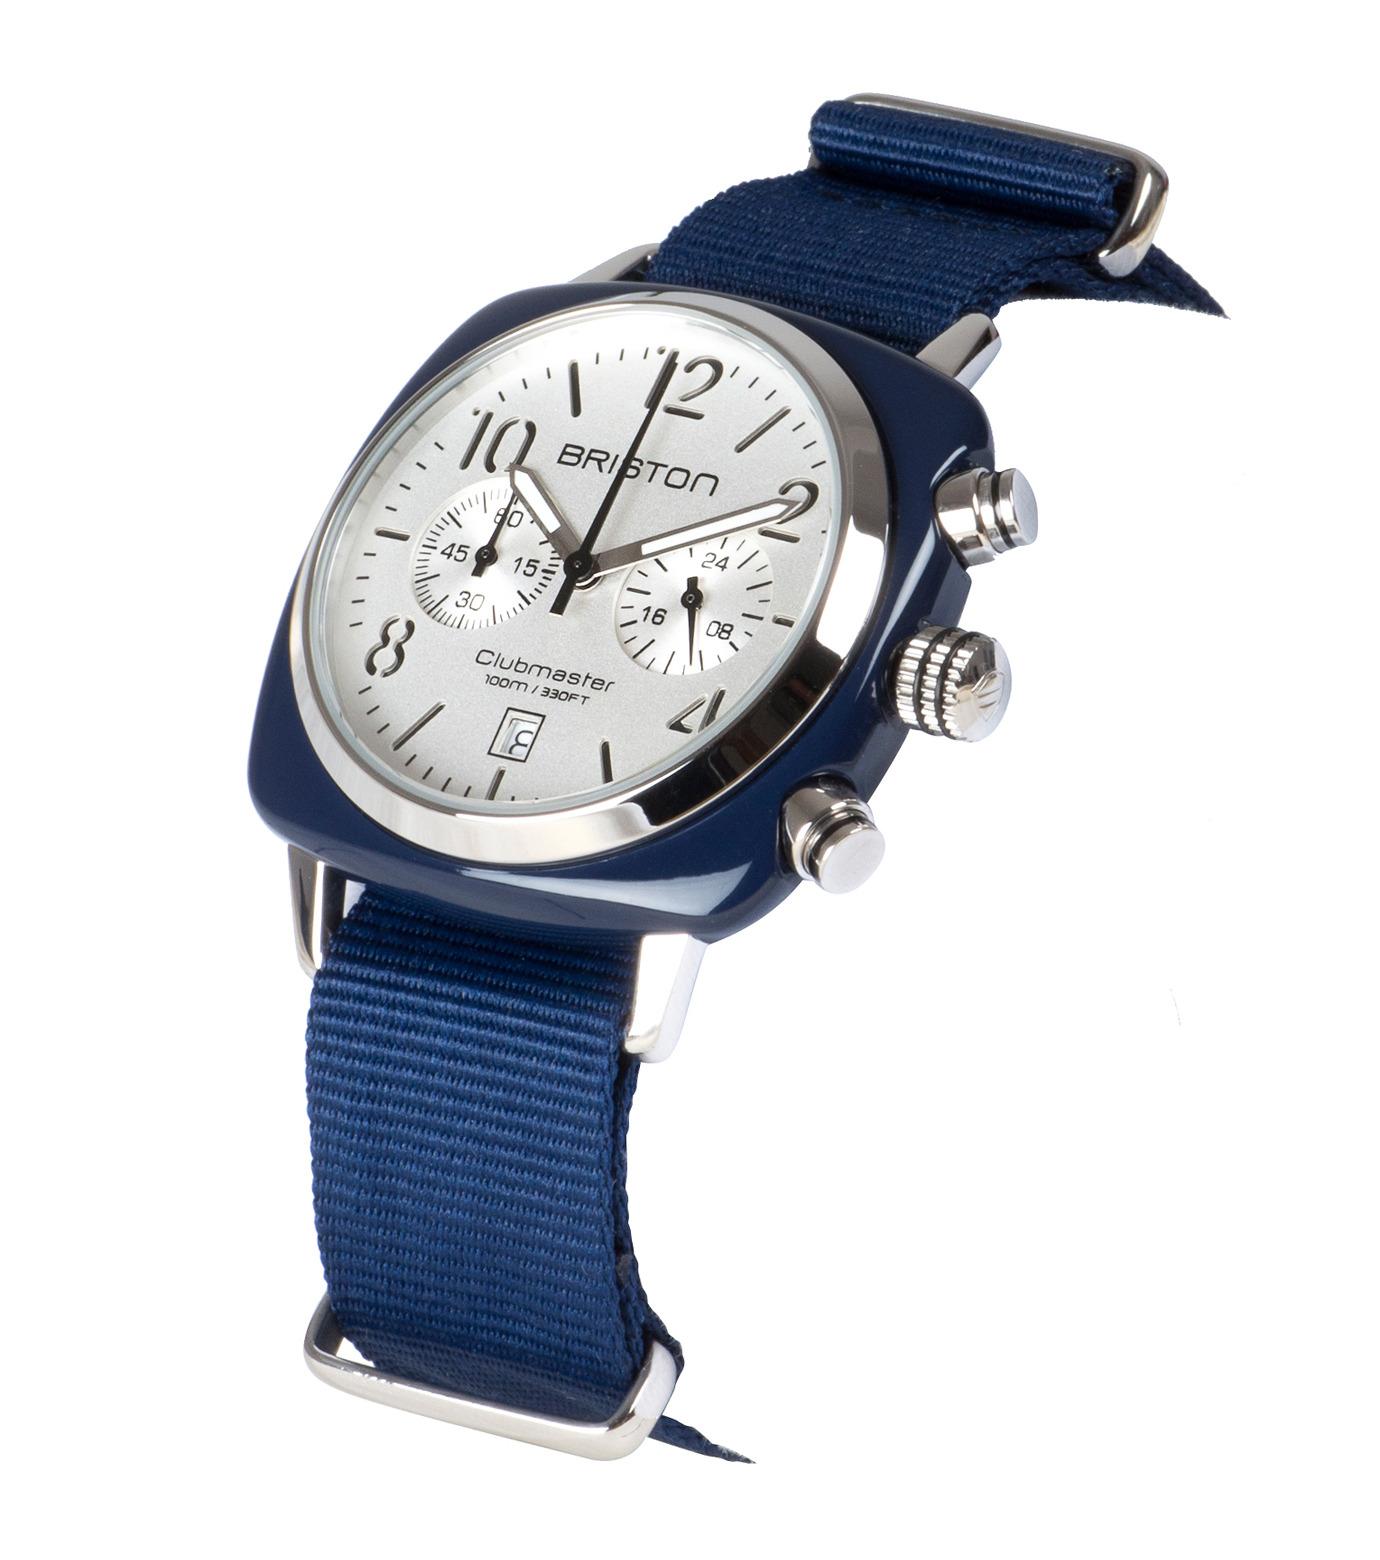 BRISTON(ブリストン)のCHRONO DATE-BLUE(ウォッチ/watch)-DATE-92 拡大詳細画像2